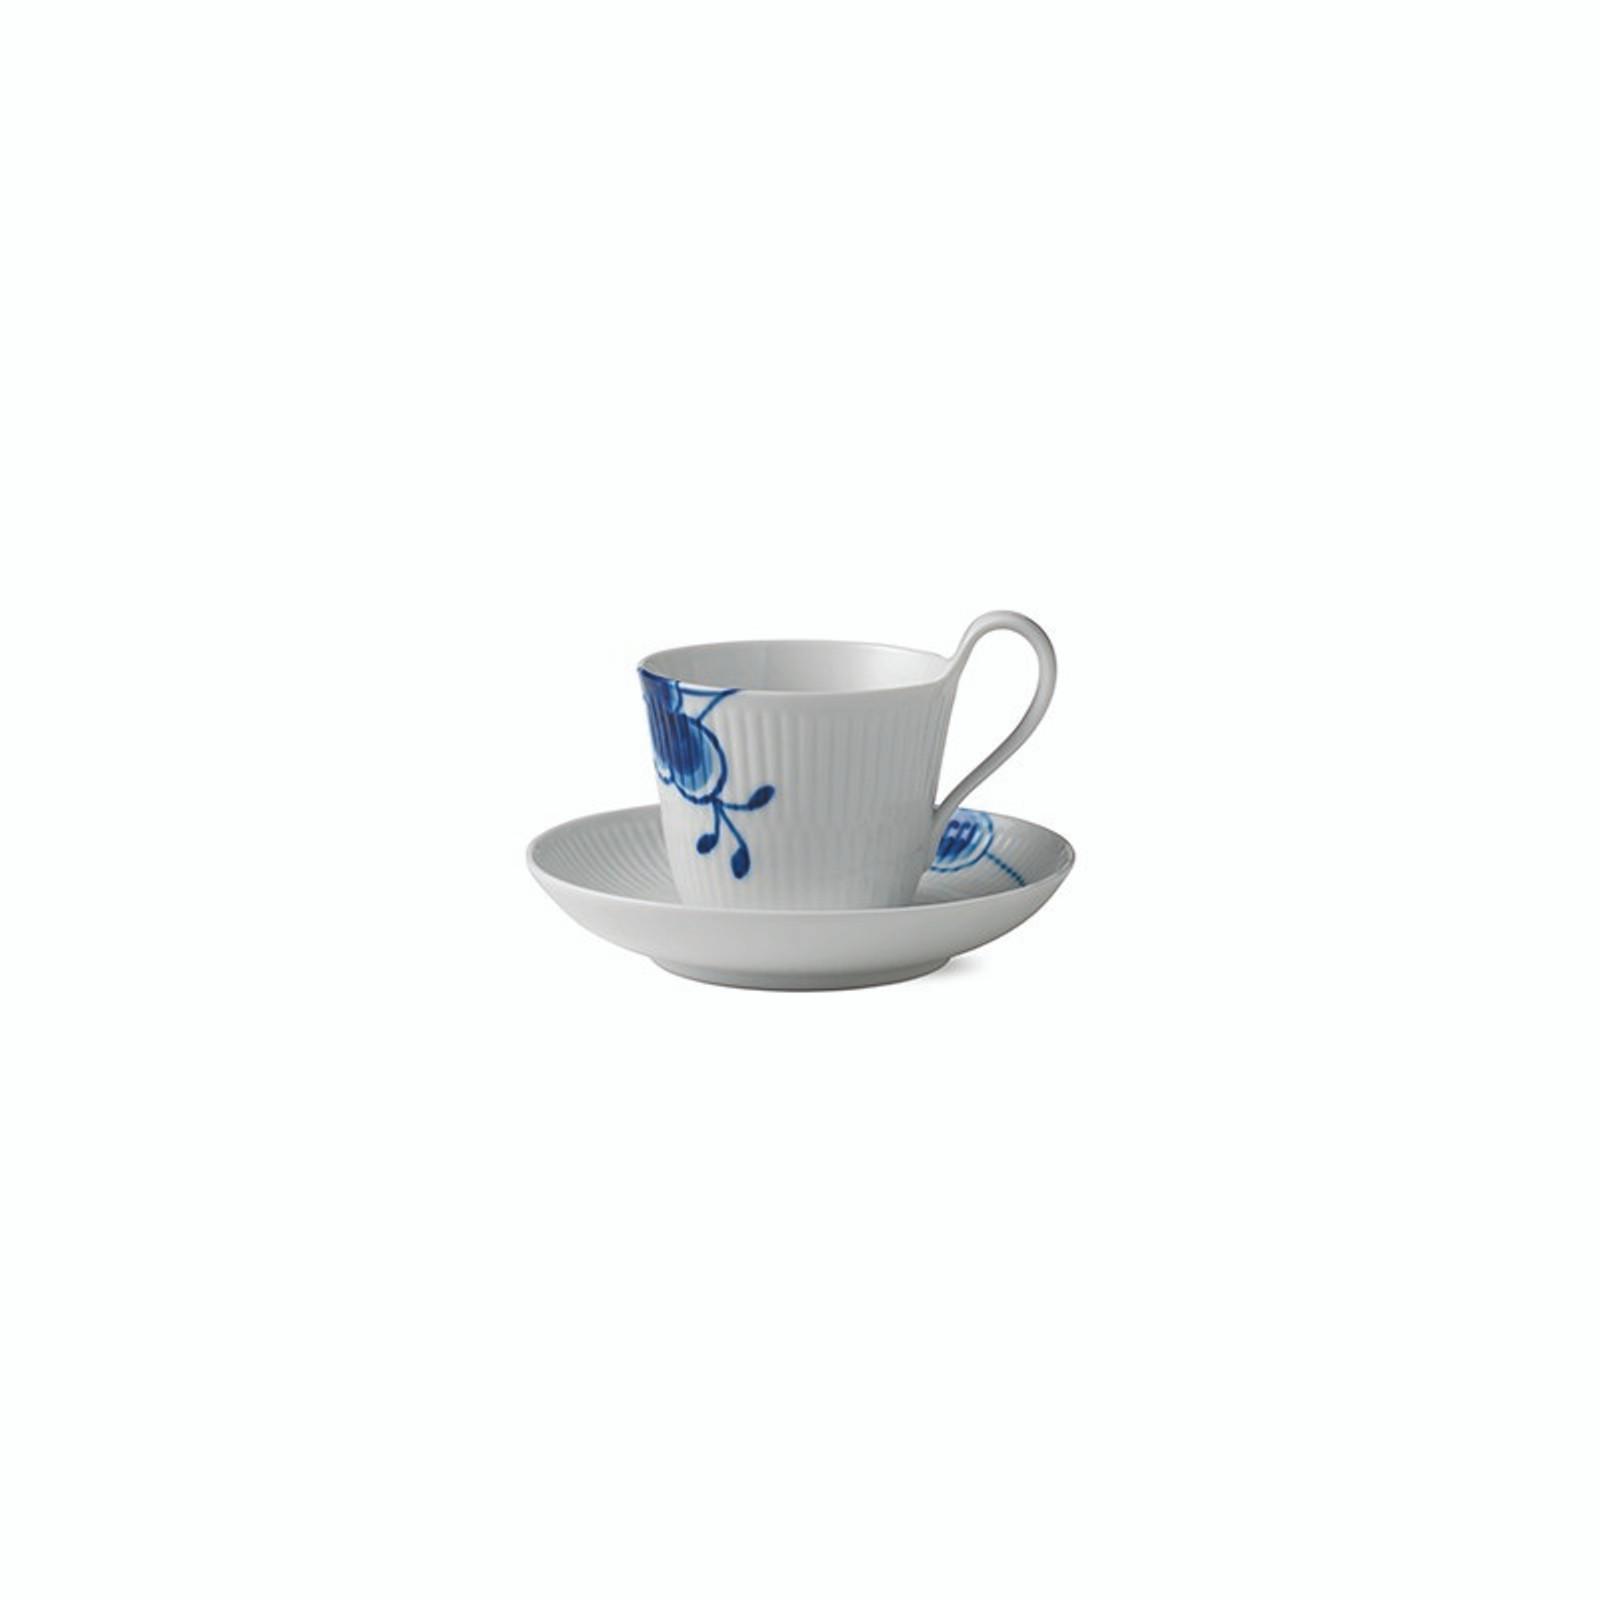 Royal Copenhagen Blue Fluted Mega - High Handled Cup and Saucer #2, 8.5 oz. (1016909)